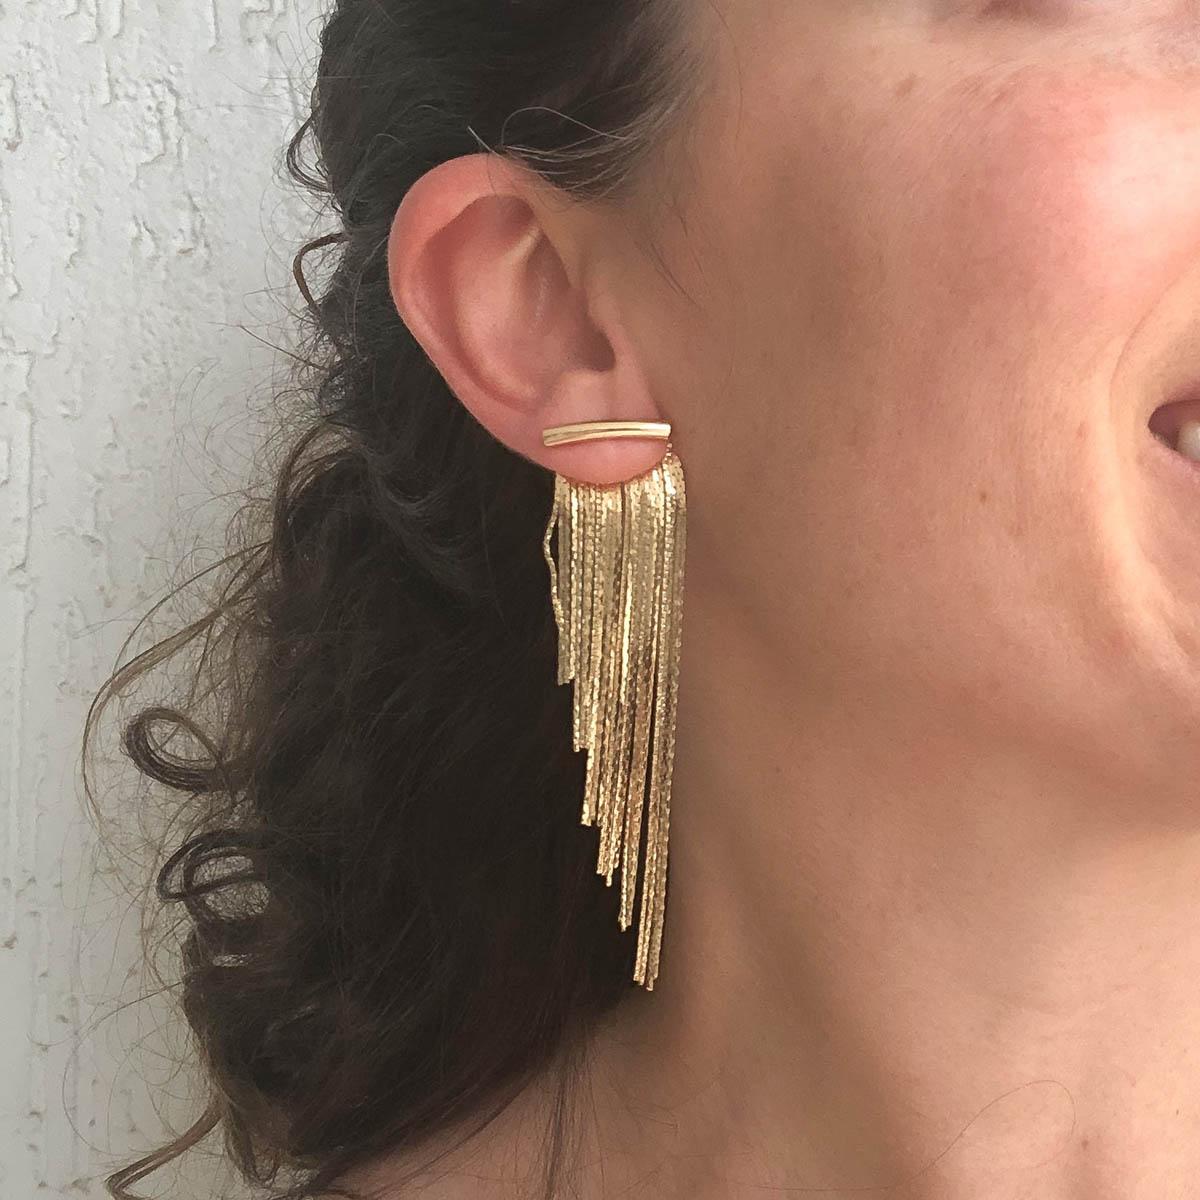 Brinco Aline Folheado a Ouro 18K Ear Jacket Franjas